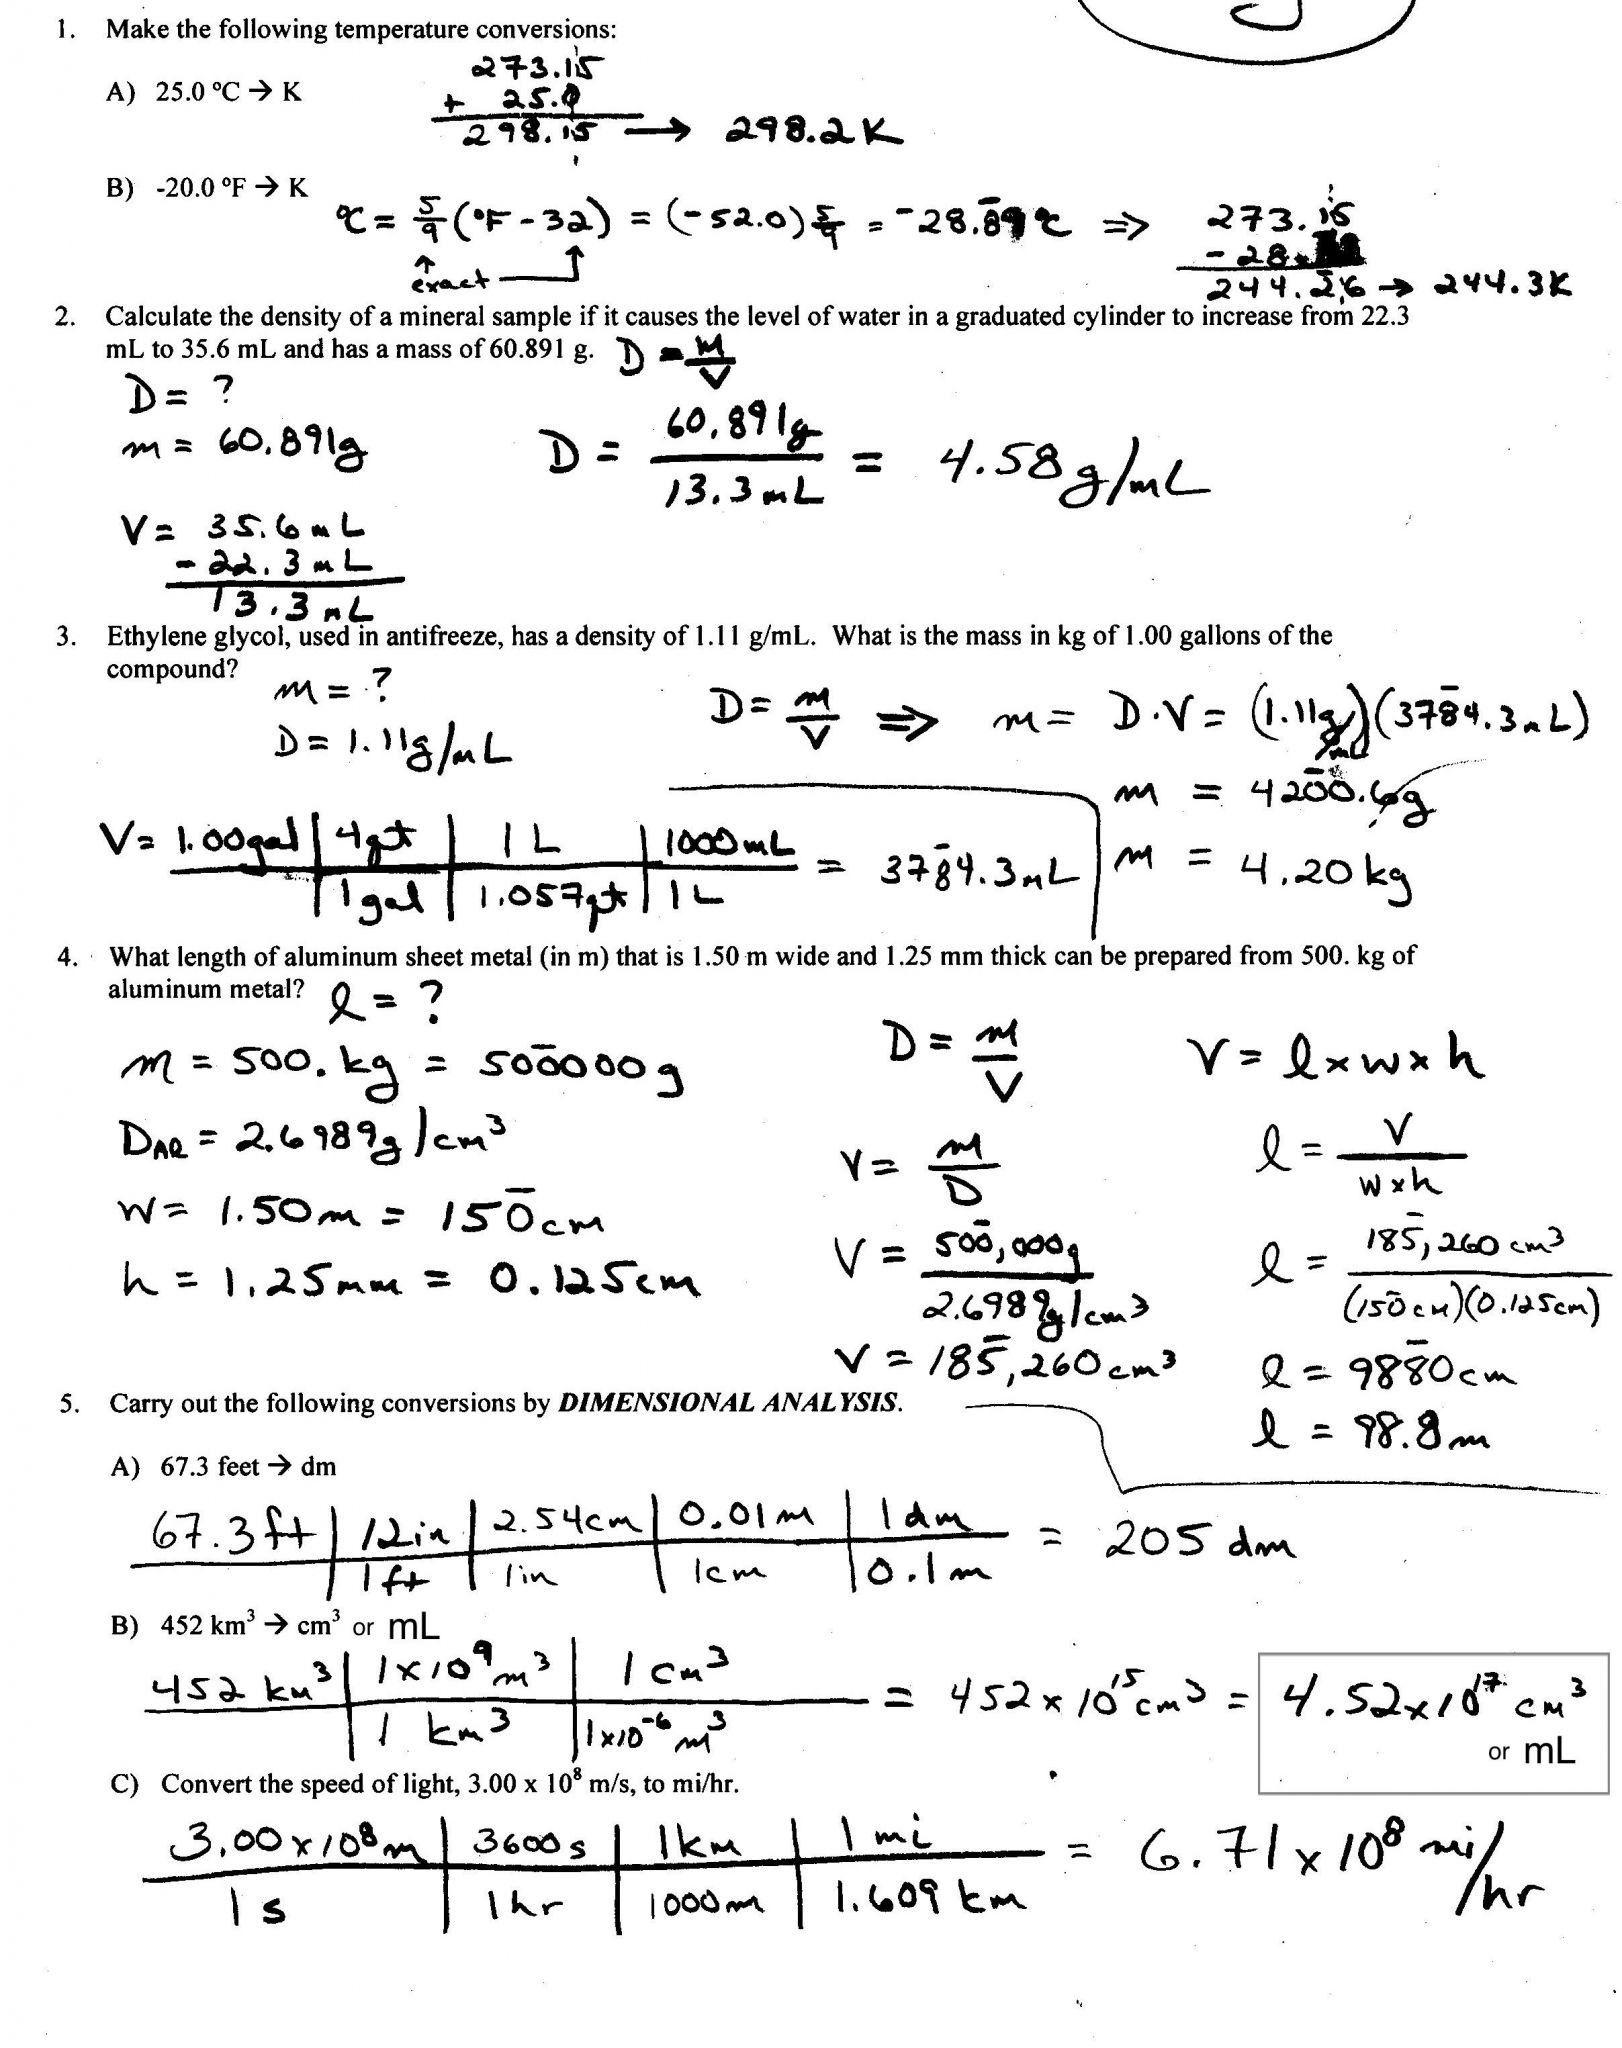 Generalqualified Science 8 Density Calculations Worksheet